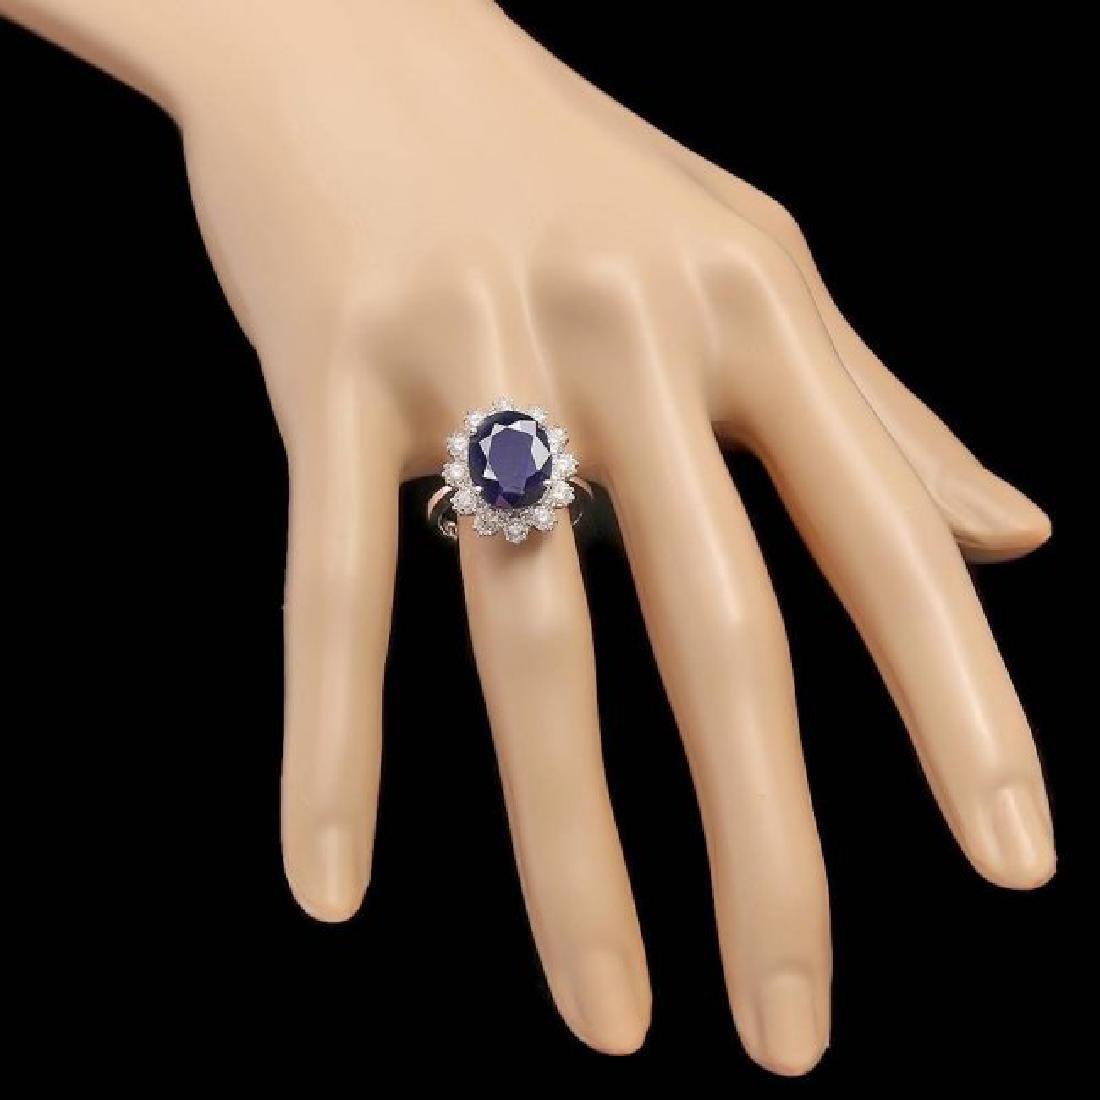 14k Gold 6.00ct Sapphire 1.35ct Diamond Ring - 3